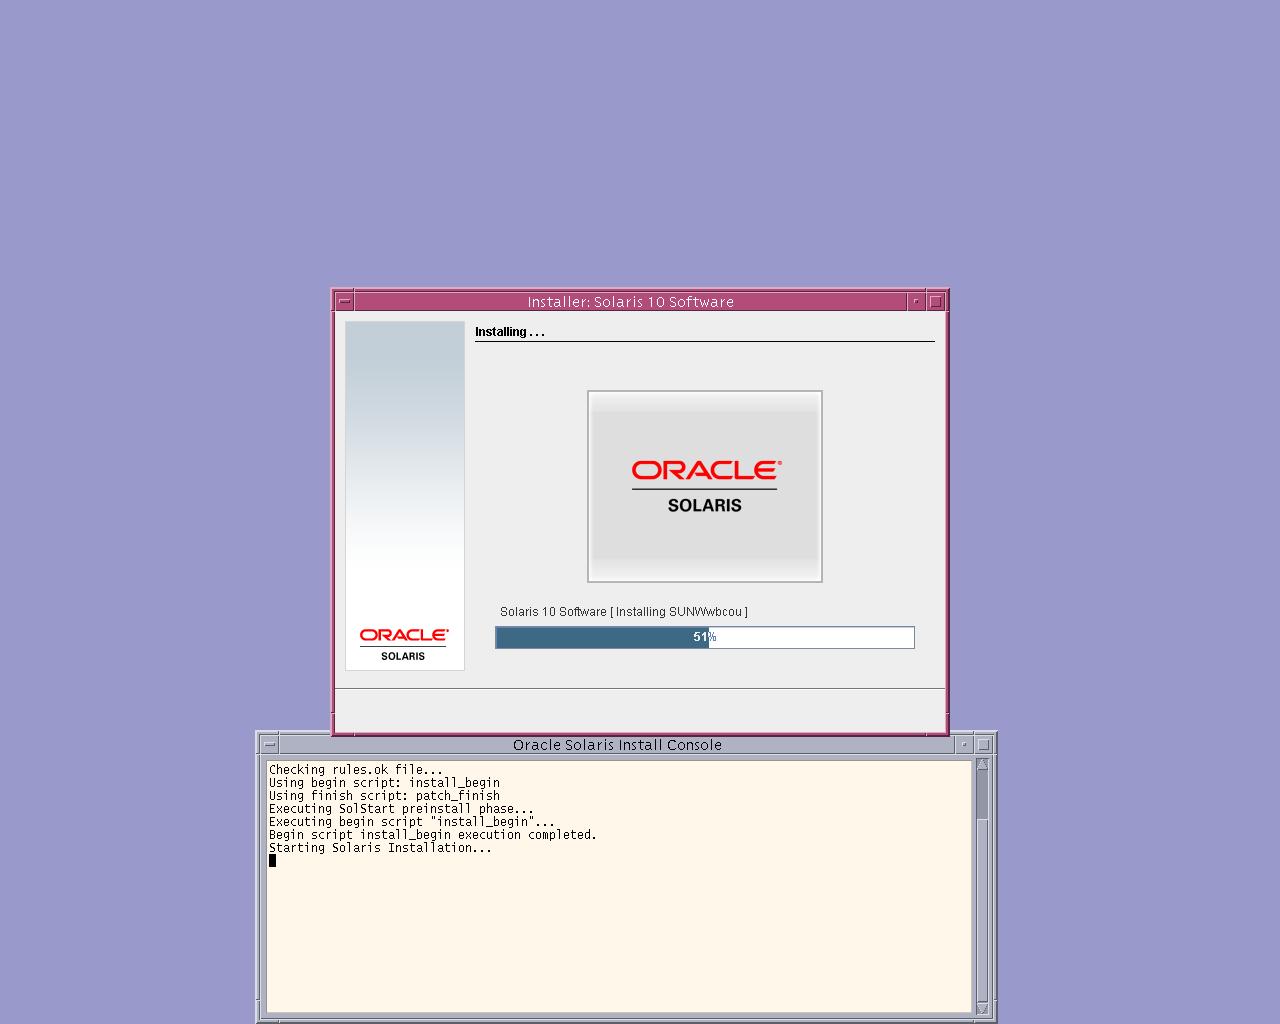 Oracle solaris 10 8 11 download